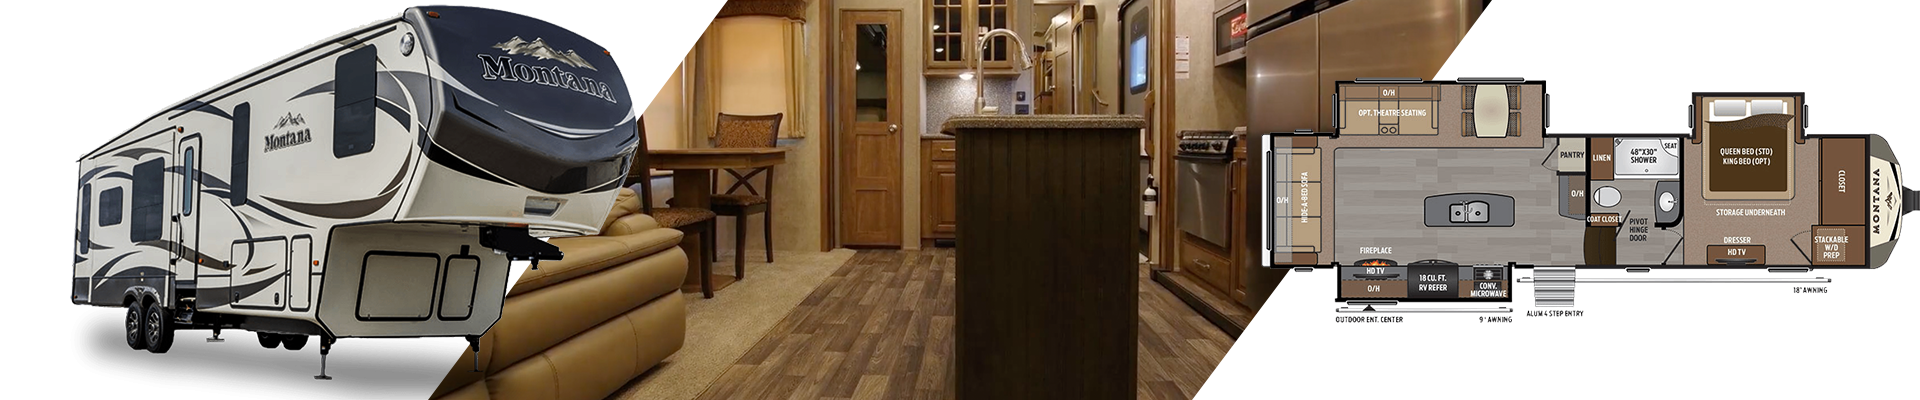 Keystone Montana fifth wheel - interior, exterior and floorplan views.